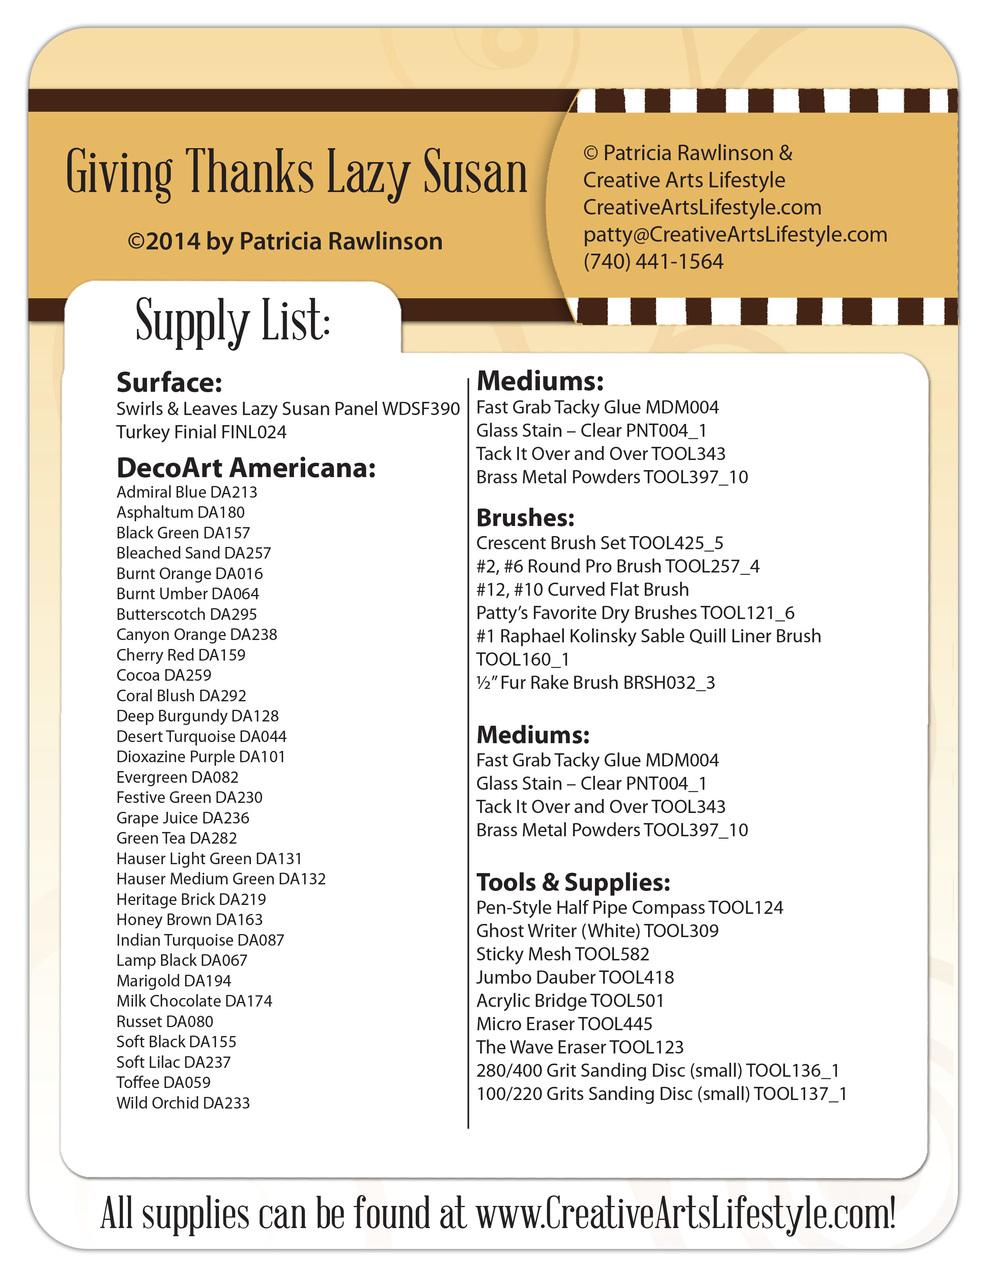 Giving Thanks Lazy Susan E-Packet - Patricia Rawlinson